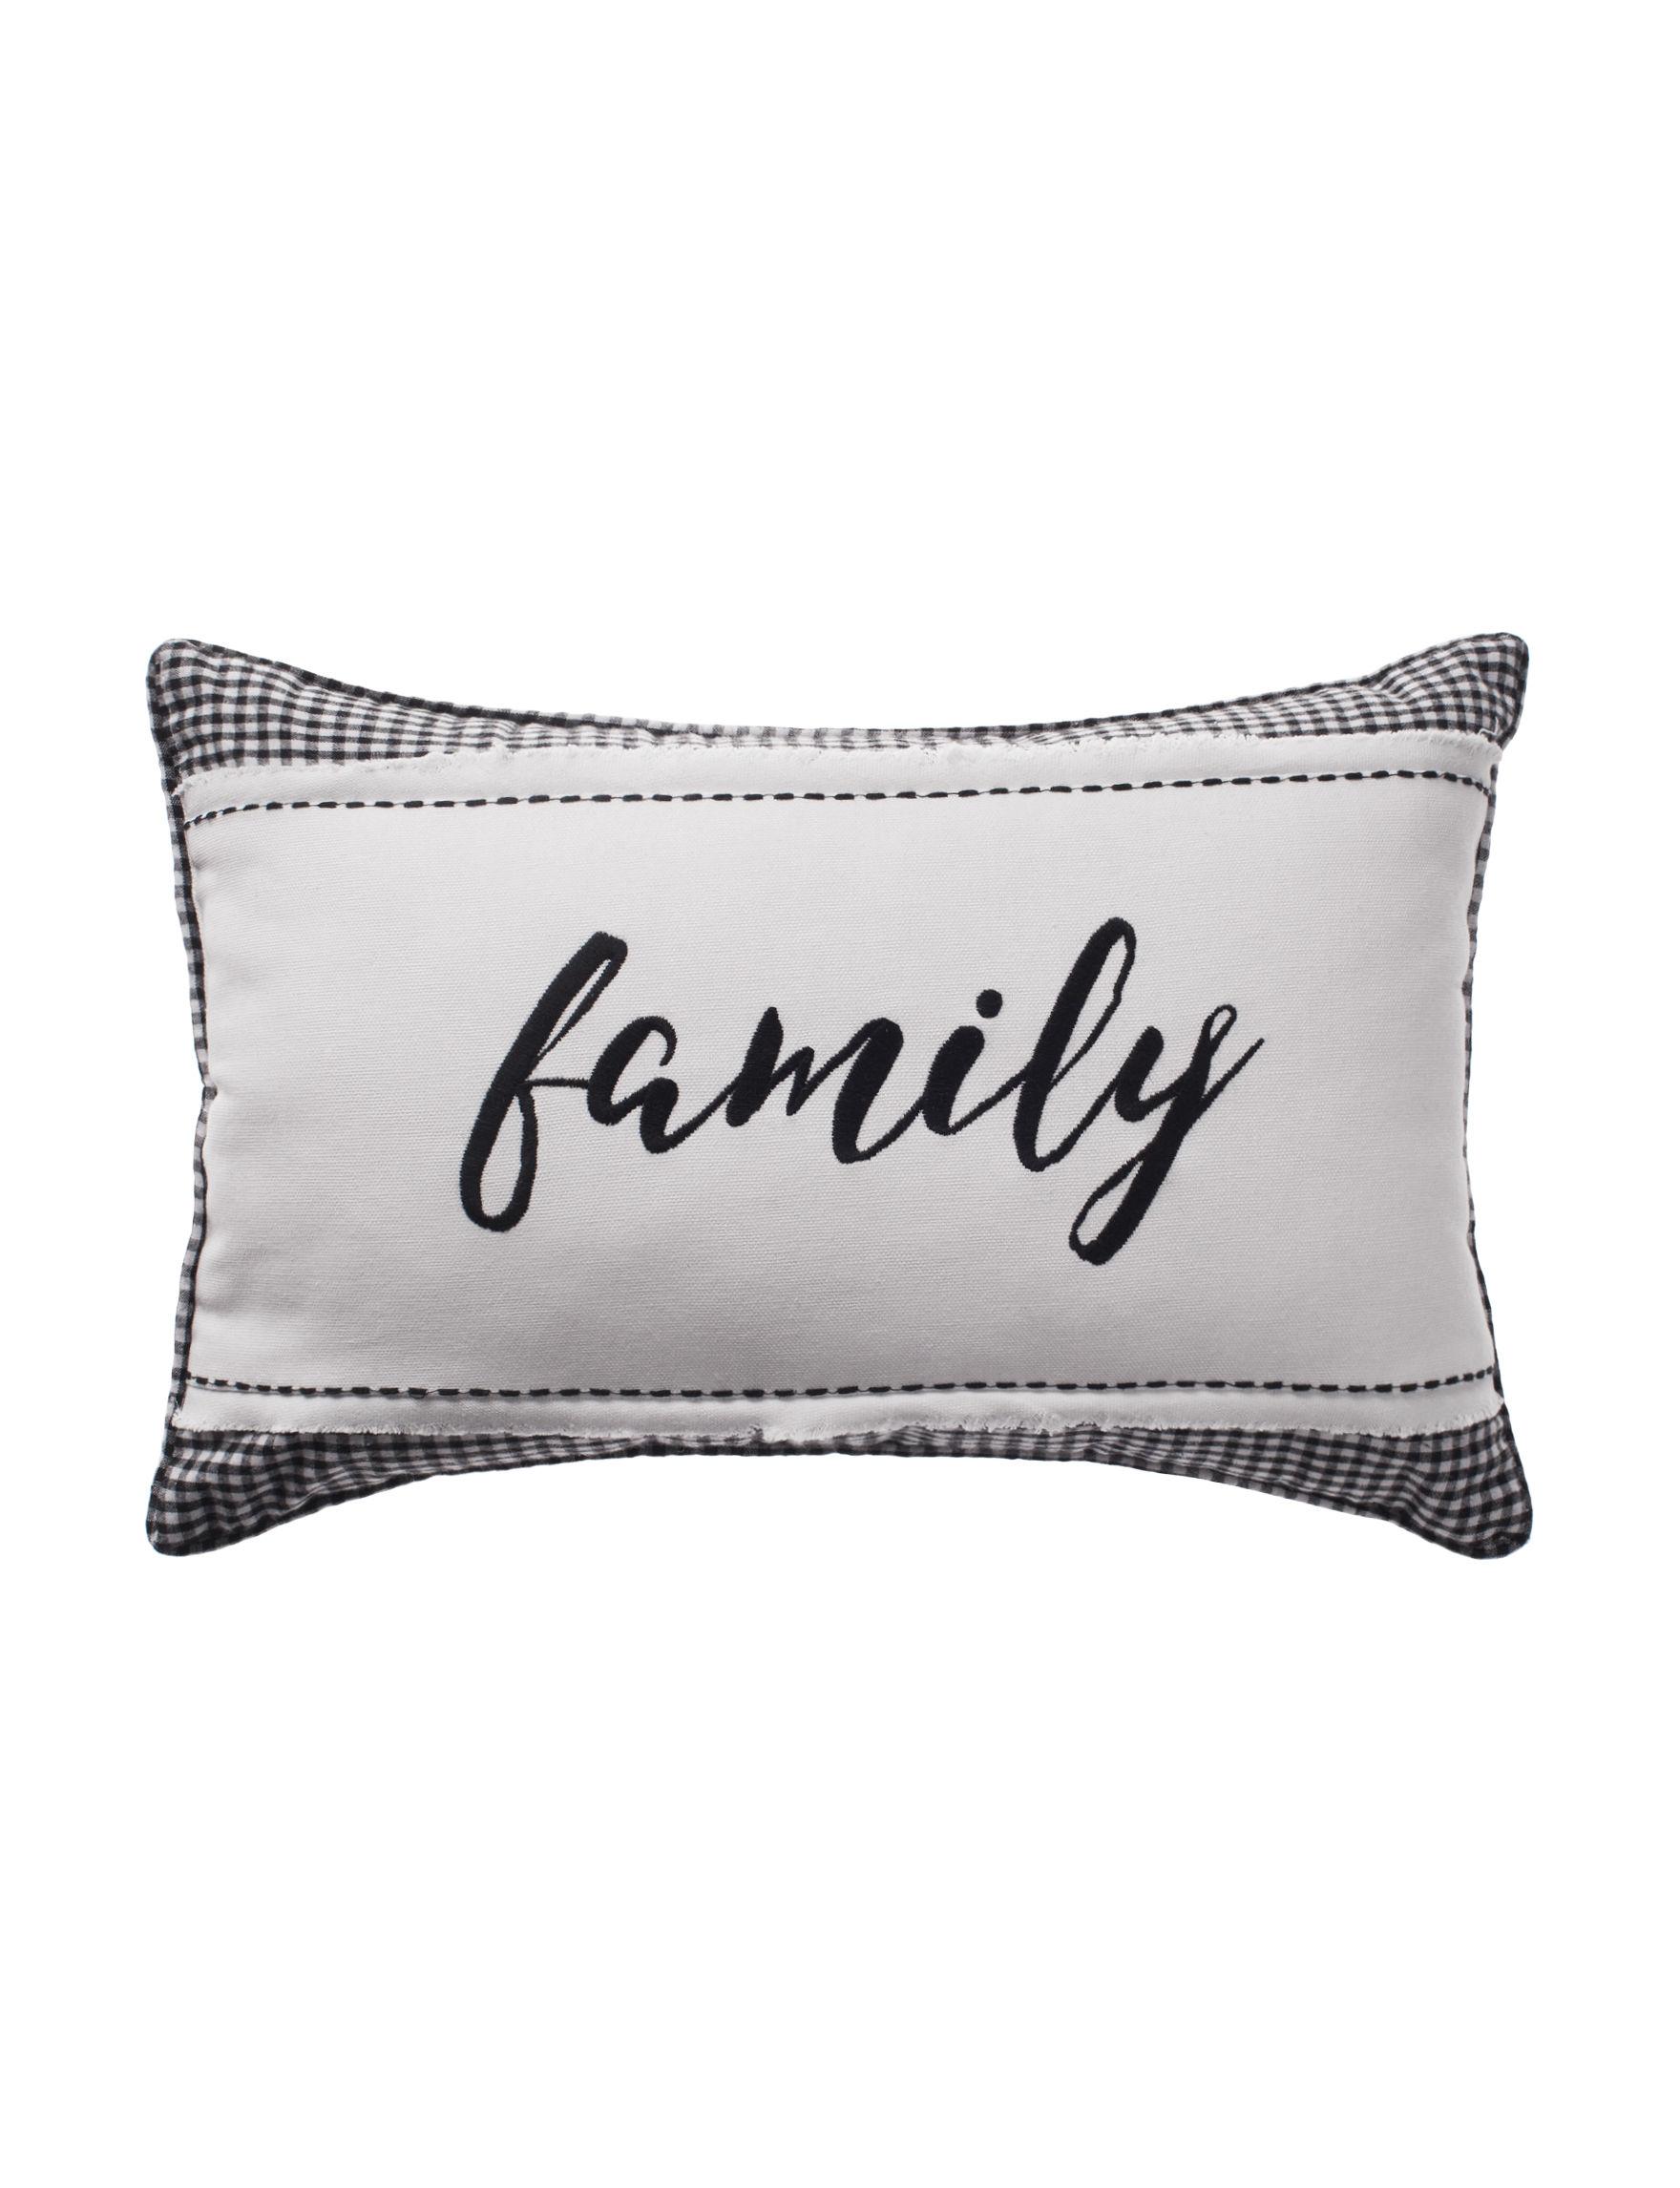 Deco White / Black Decorative Pillows